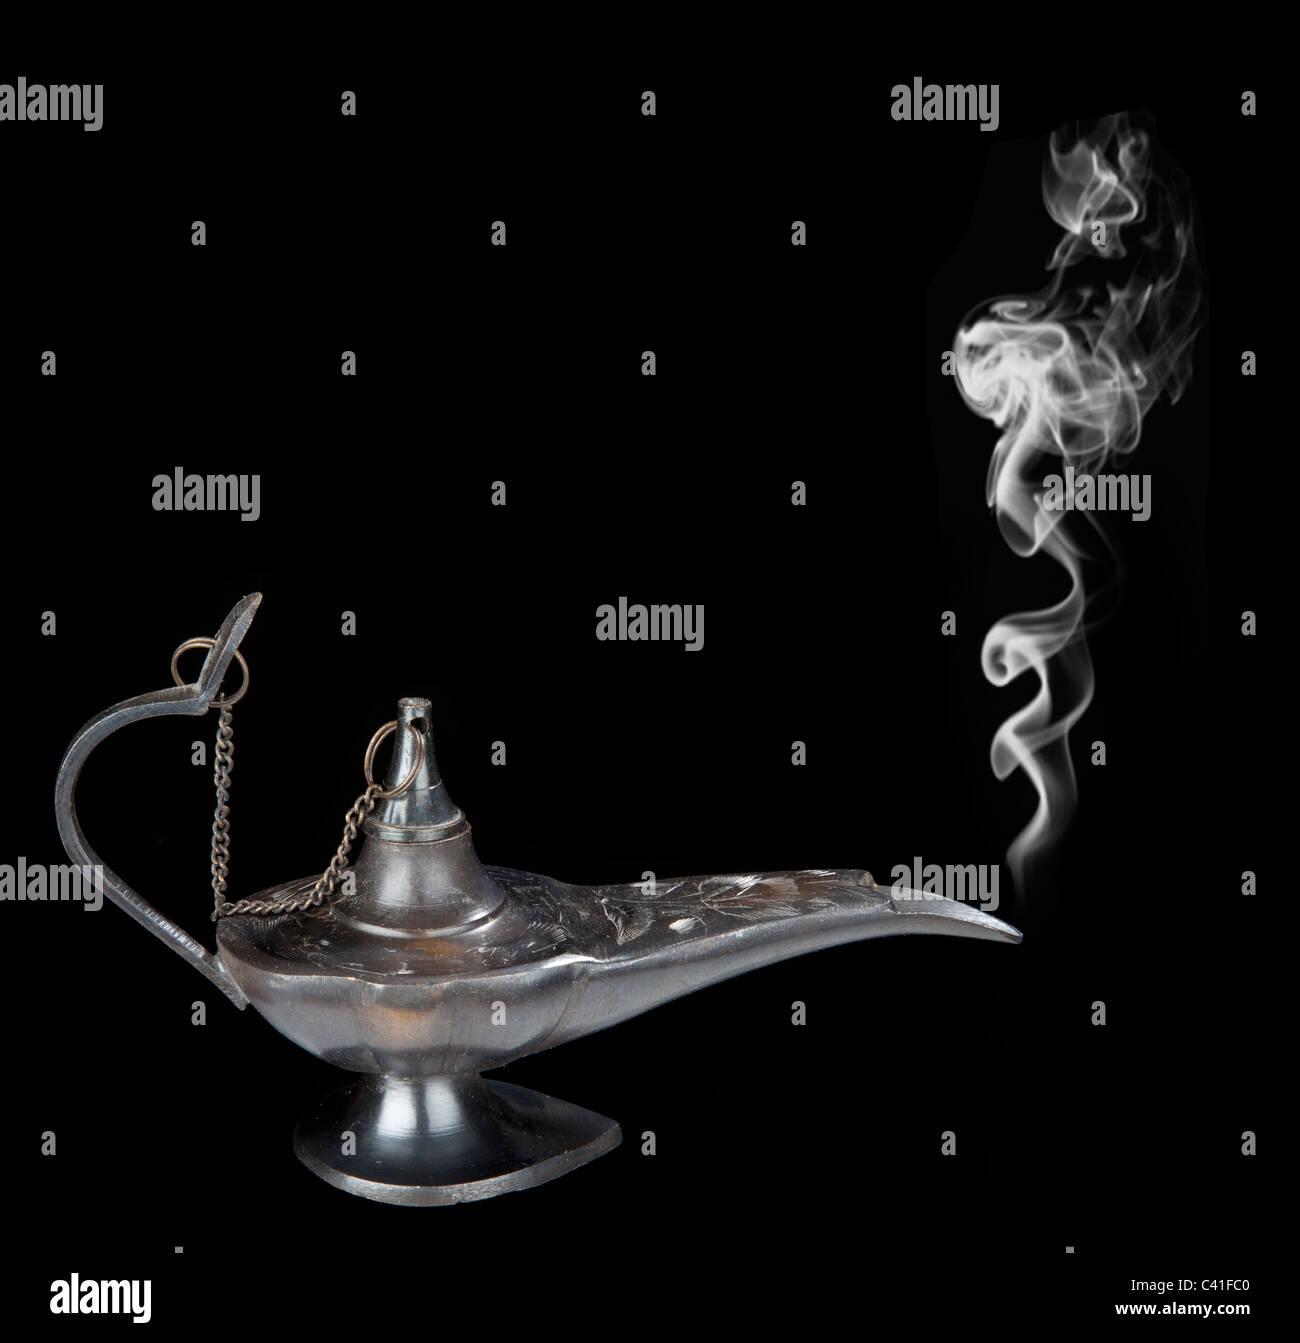 Genie lamp with a smoke - Stock Image